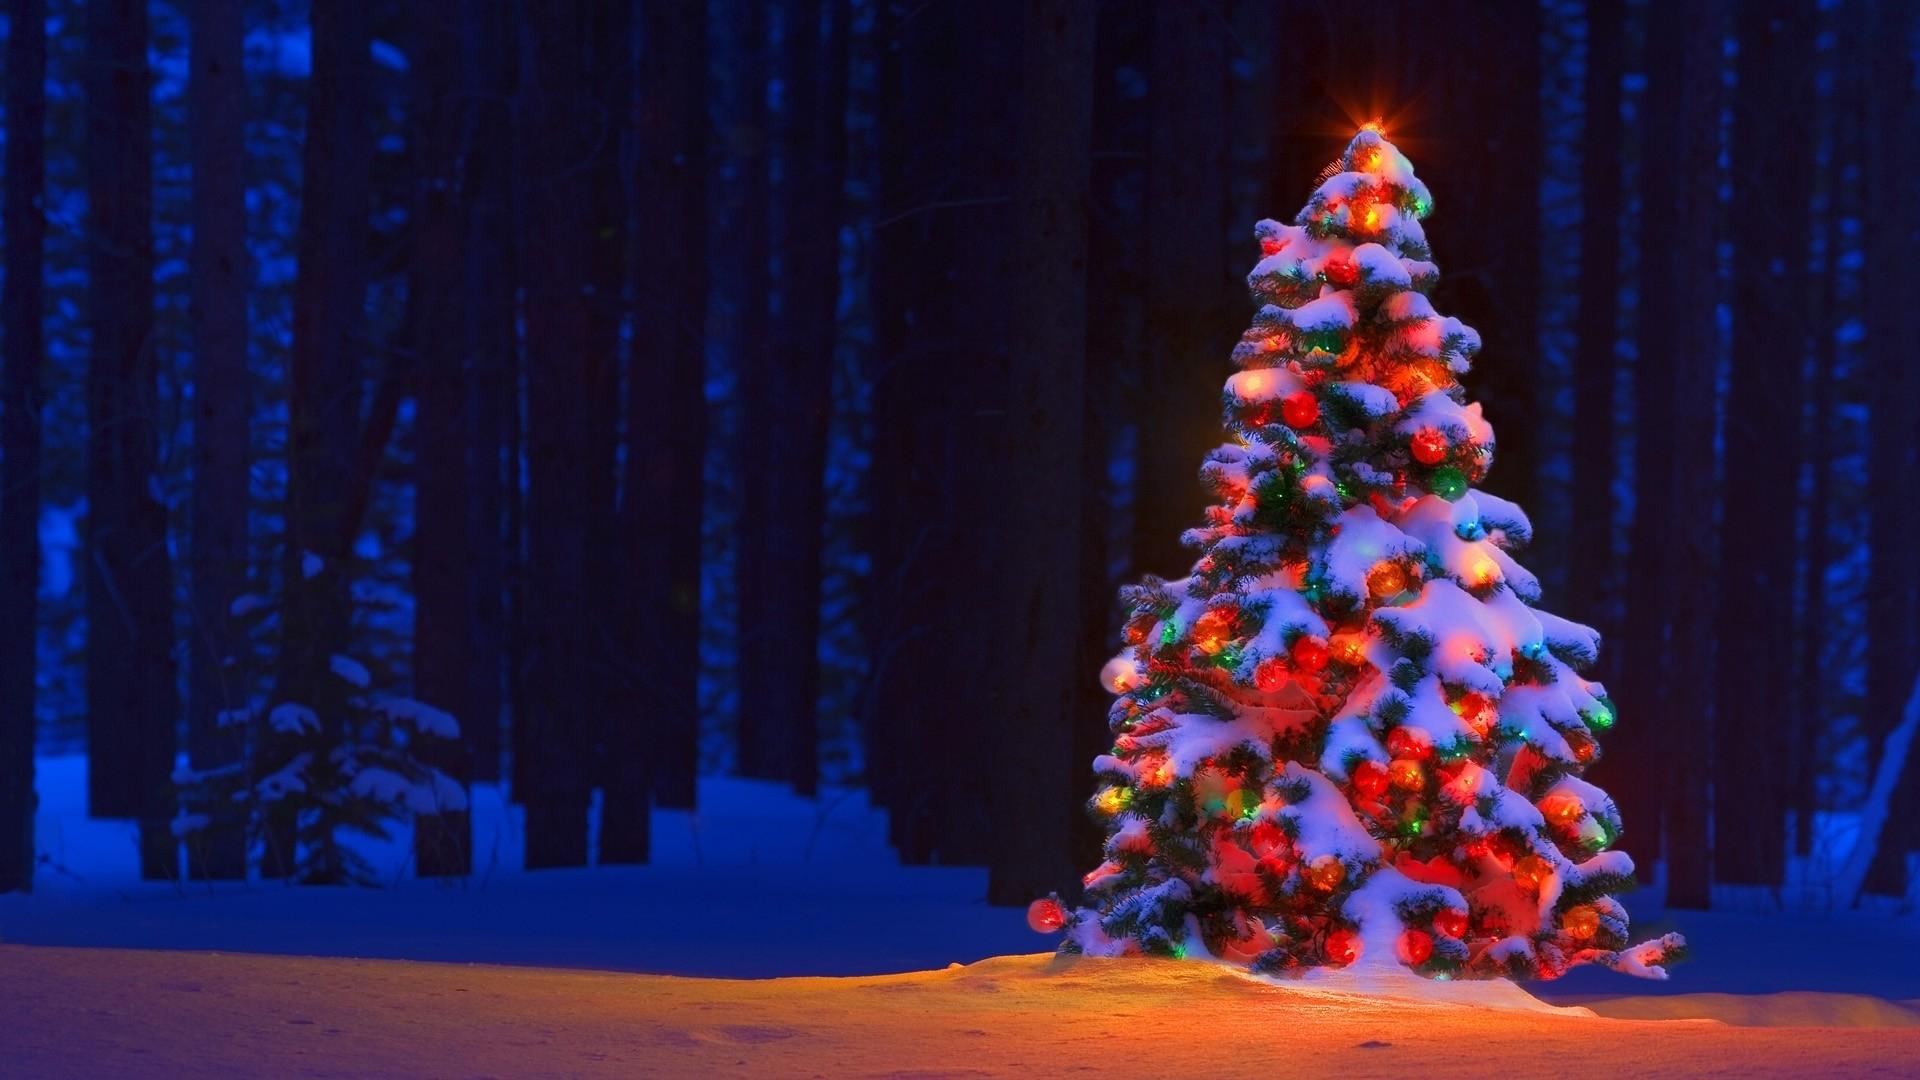 christmas-lights-tree-desktop-backgrounds - wallpaper.wiki